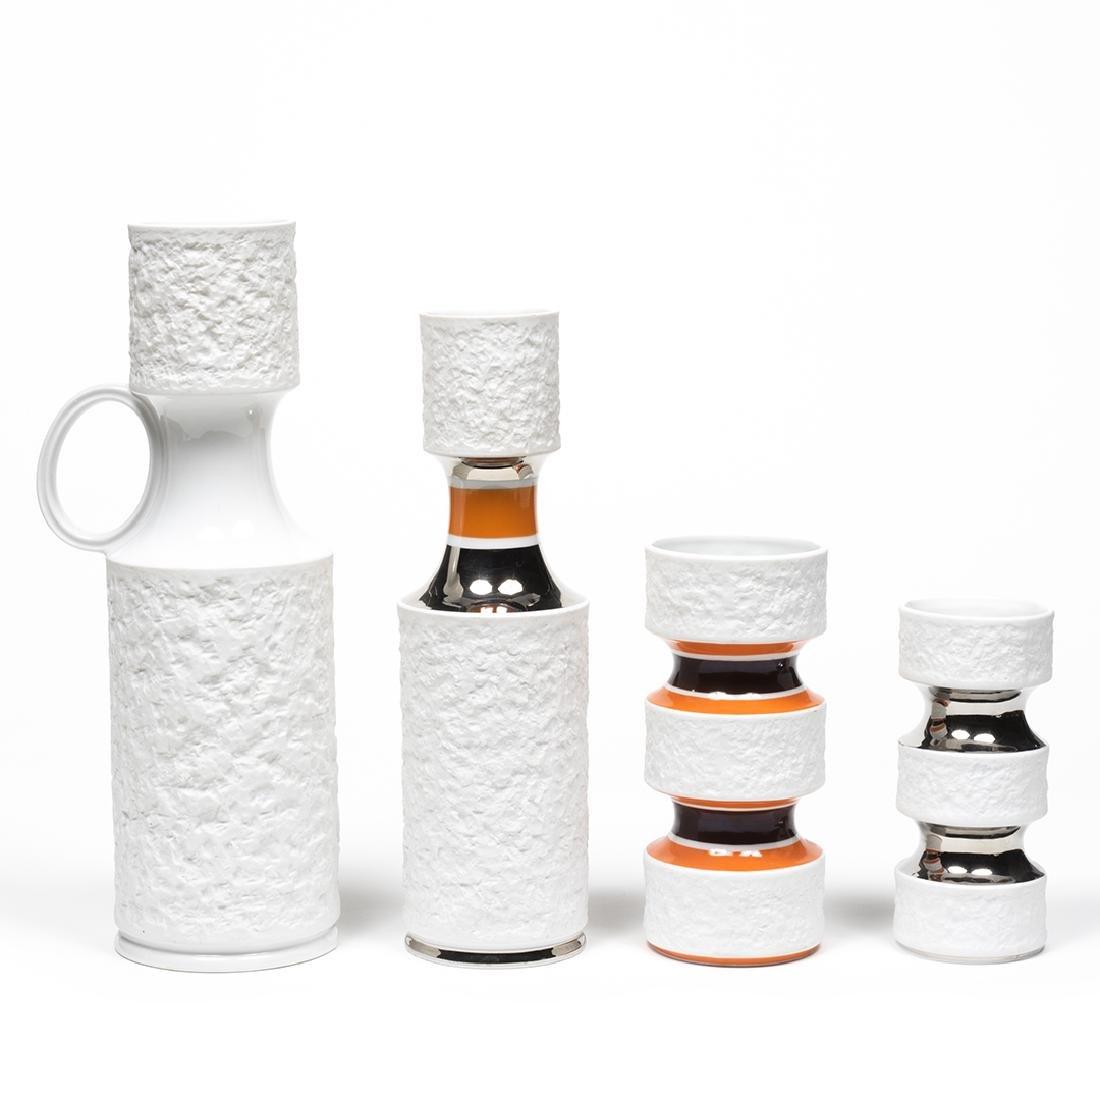 KPM Bisque Vases - 2